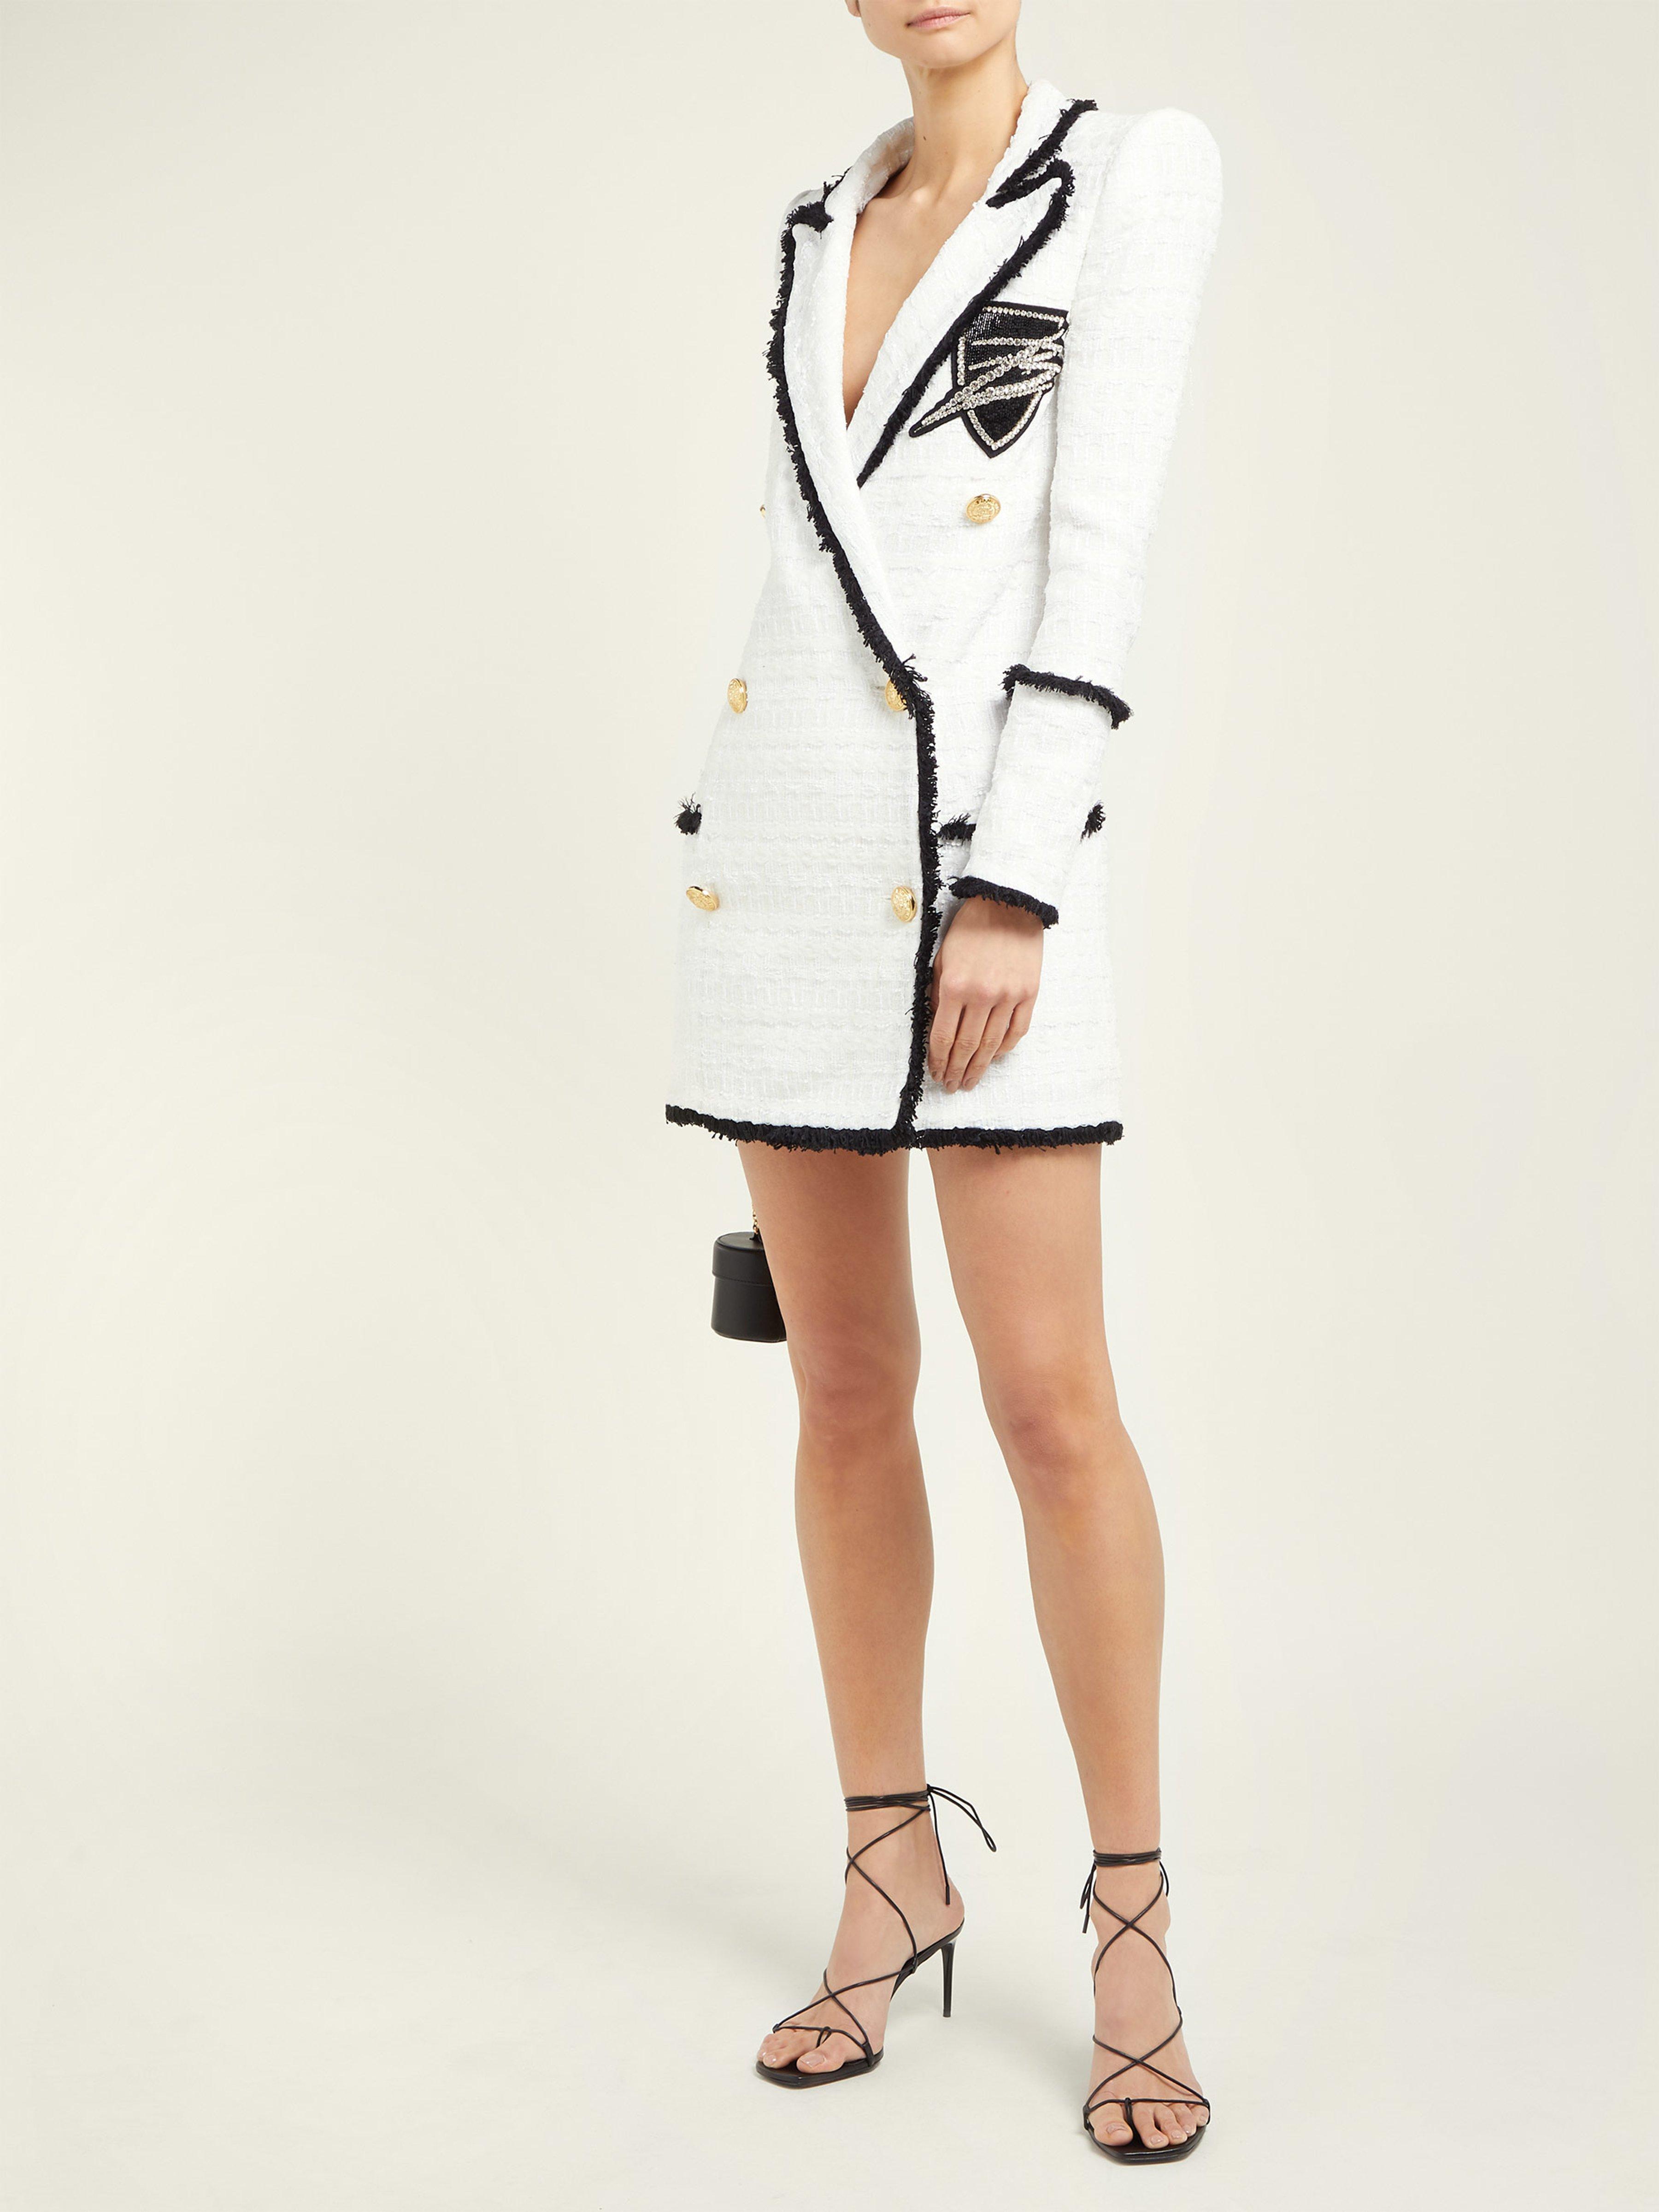 1d18ad0a Balmain - White Double Breasted Tweed Blazer Dress - Lyst. View fullscreen